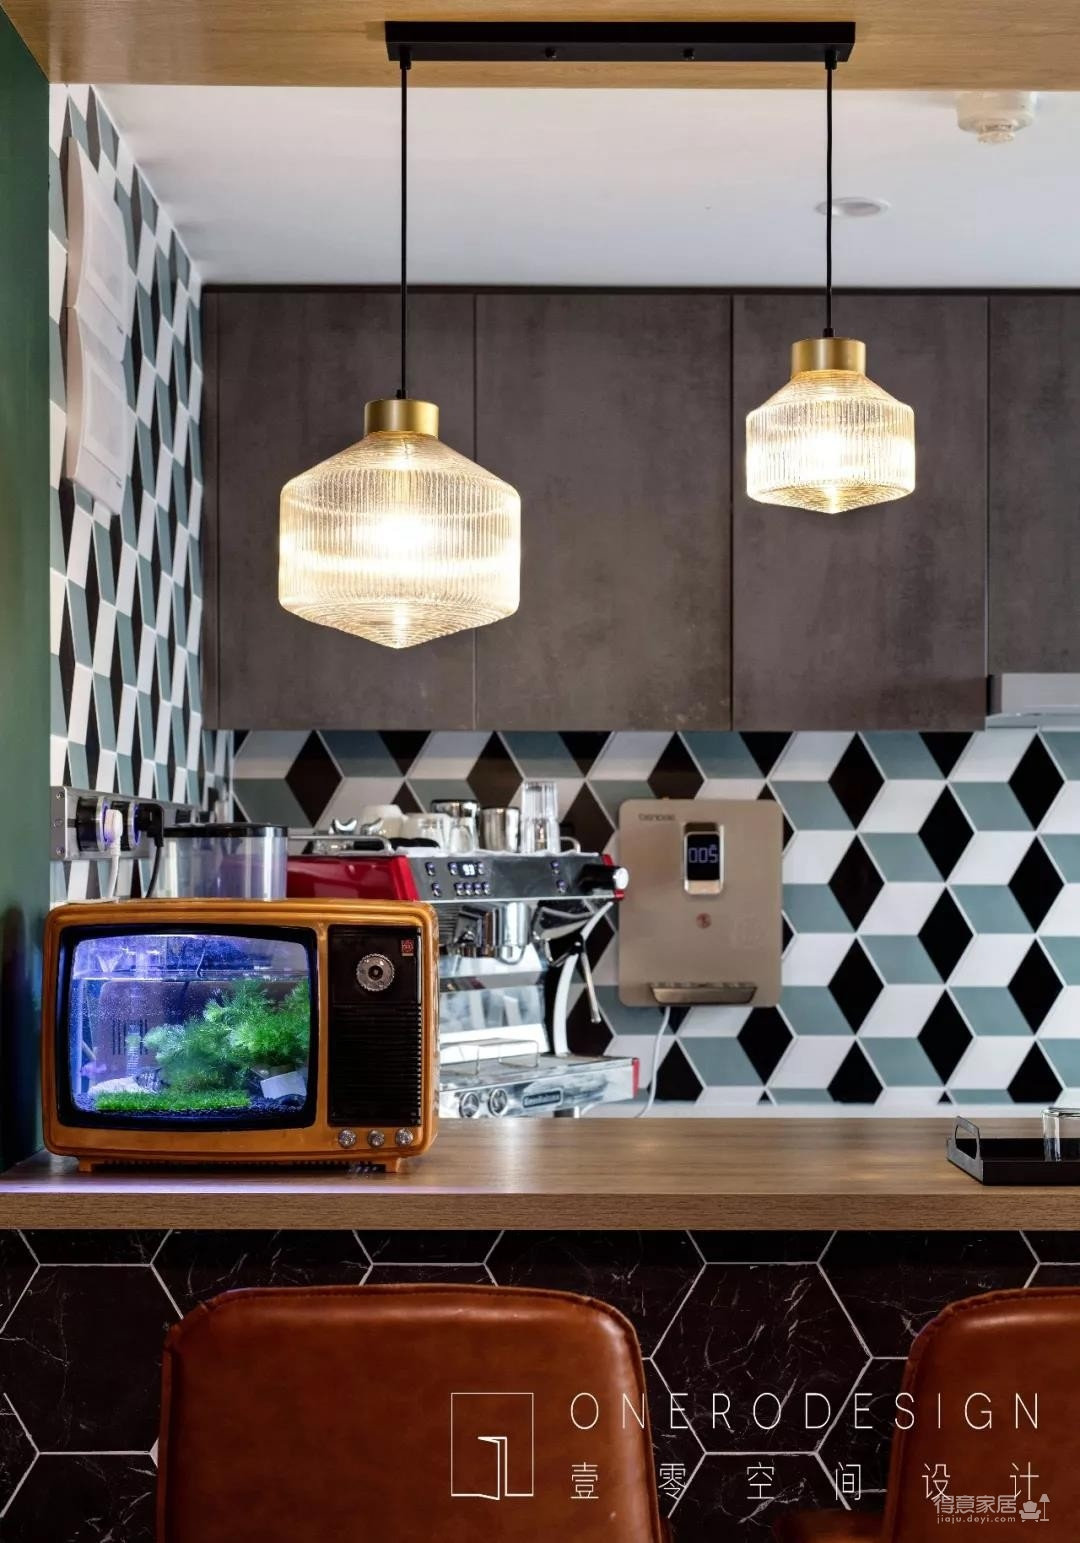 Onero Design | 131㎡精装房改工业风 — 烘焙师的自由梦之家。